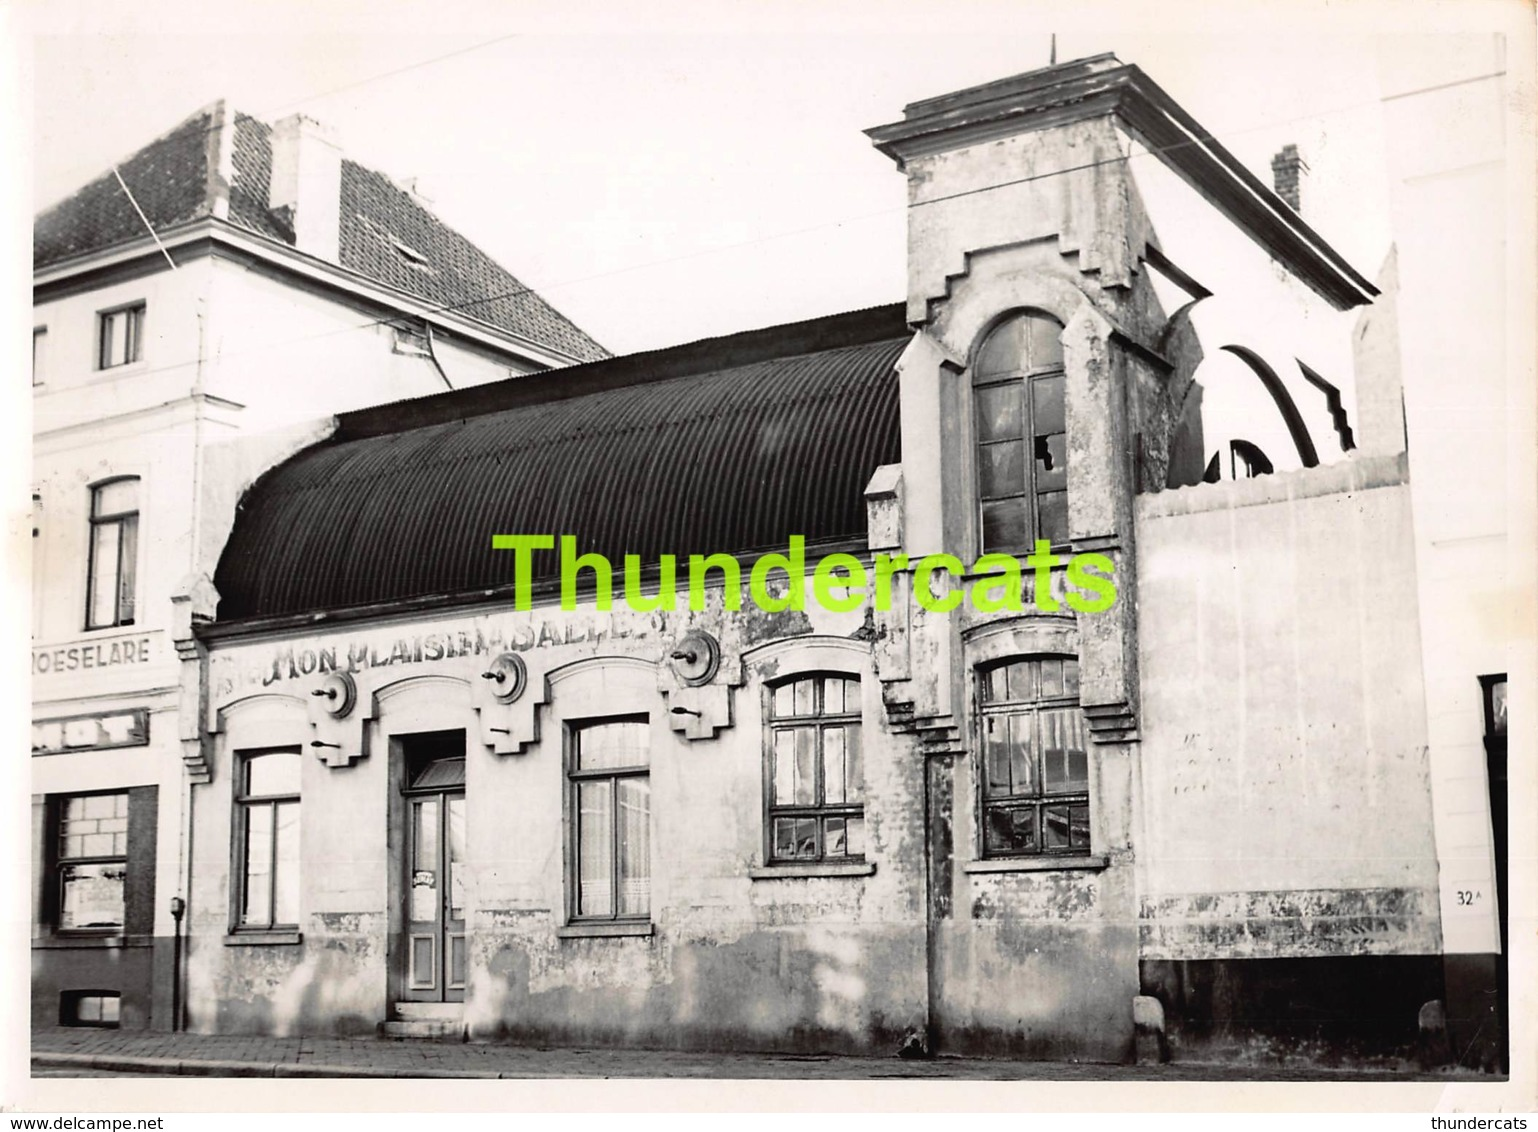 OUDE FOTO 1952 OOSTENDE 18 CM X 13 CM ANCIENNE PHOTO OSTENDE DANCING MON PLAISIR TORHOUTSESTEENWEG JULES PEURQUAERT... - Orte